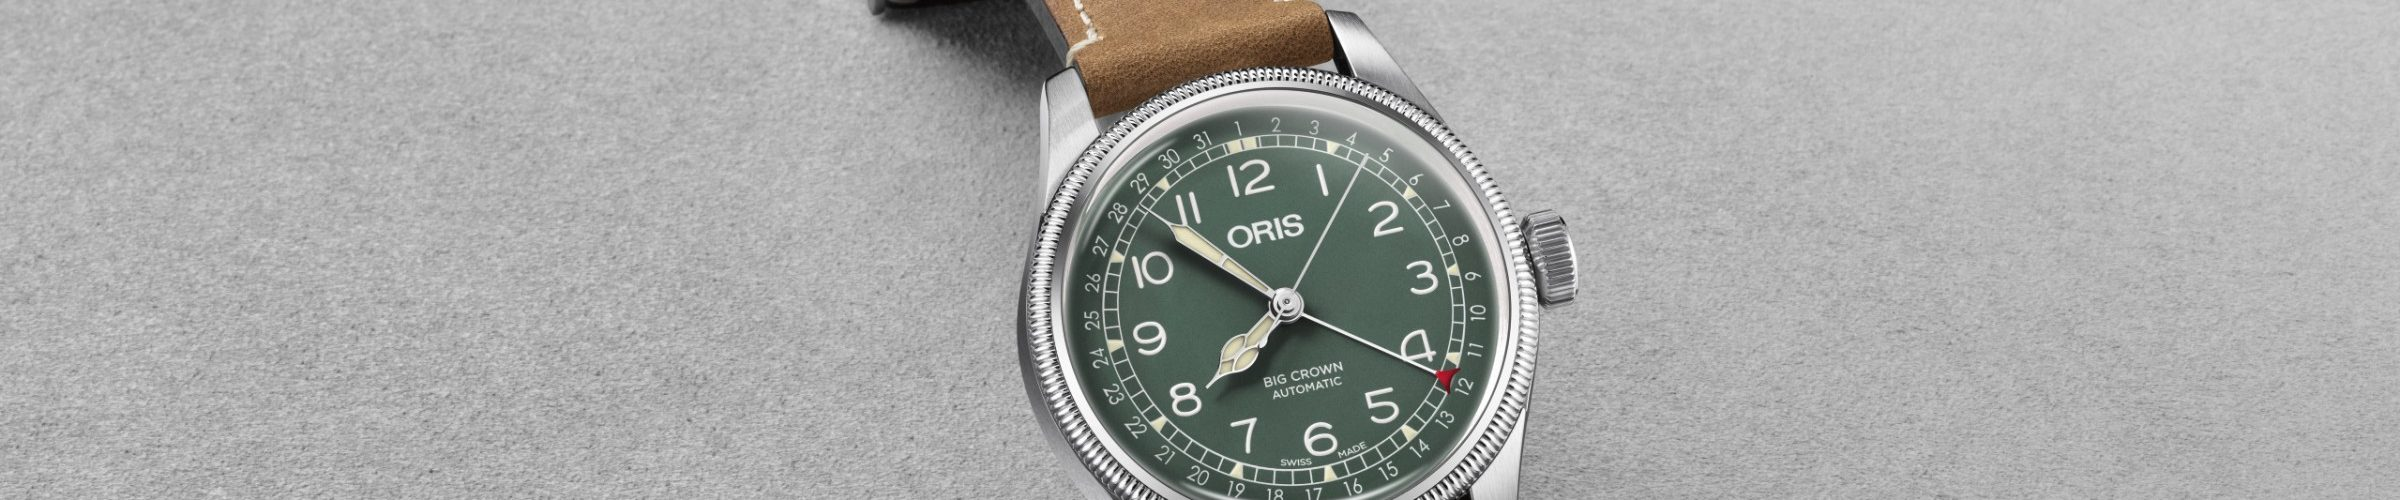 ORIS Big Crown D.26 286 HB-RAG Limited Head